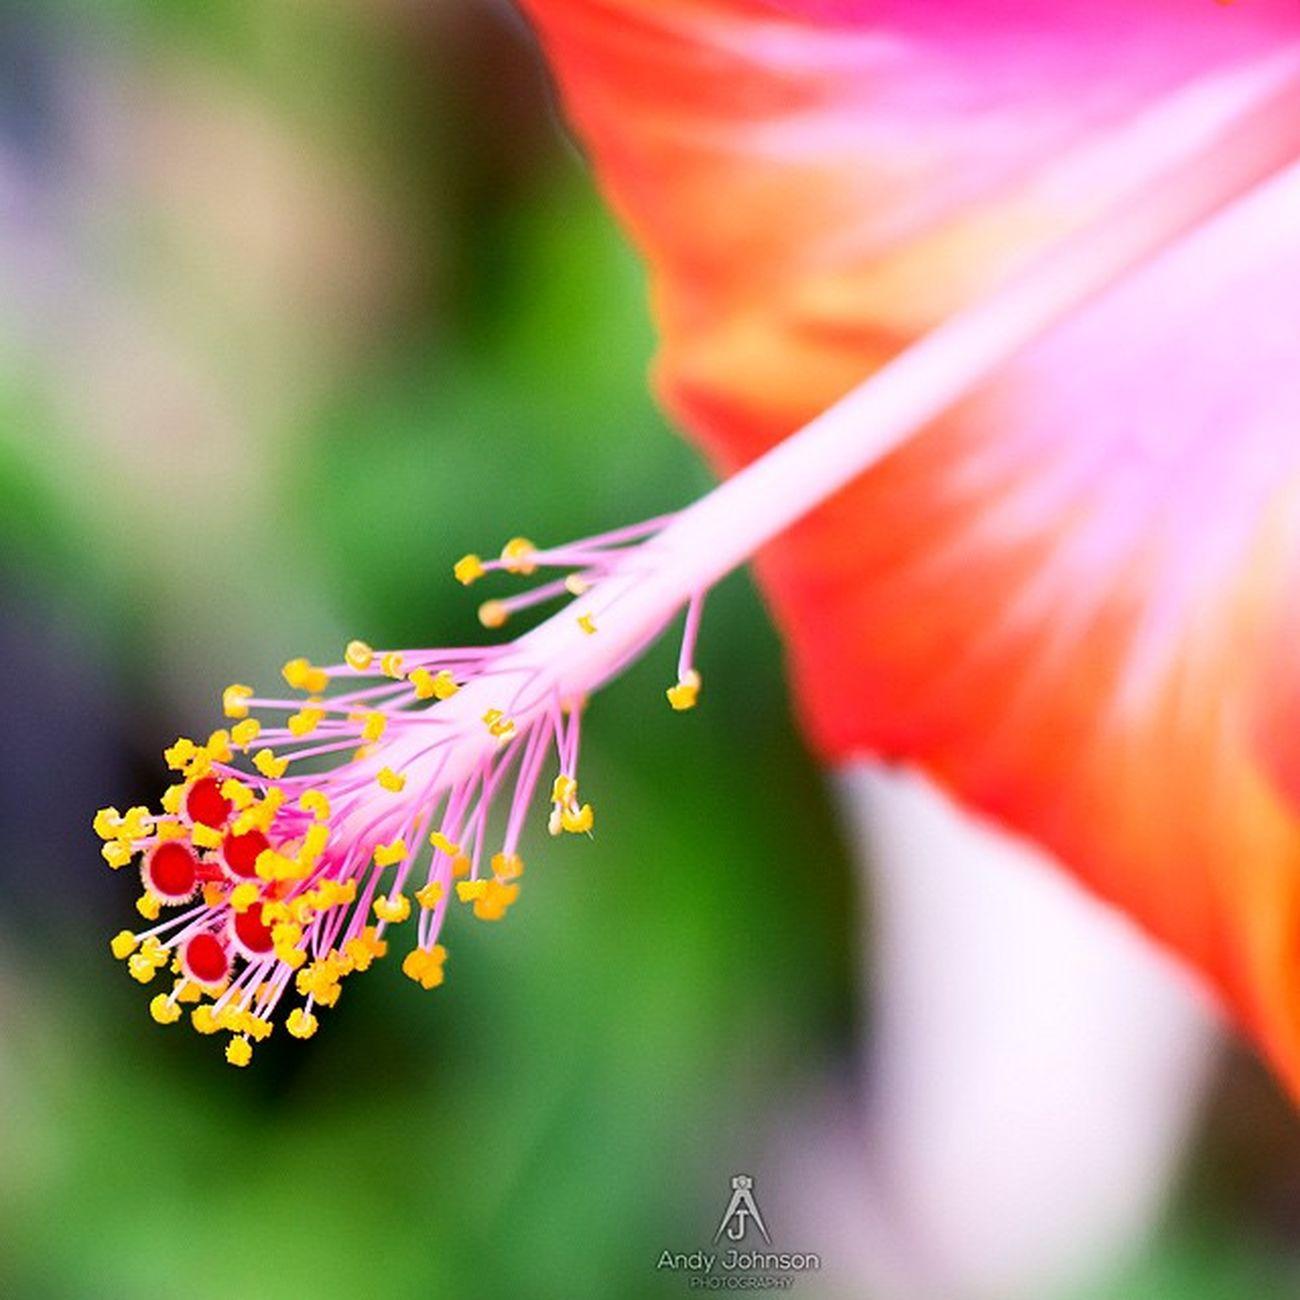 Grenada GOLDENCLiCKS Nikoncapture NikonD7100 Nature Caribbean_beautiful_landscapes Hdr_beautiful_landscapes Westindies_landscape Icu_puertorico Ilivewhereyouvacation Ig_martinique Ig_caribbean Hibiscus